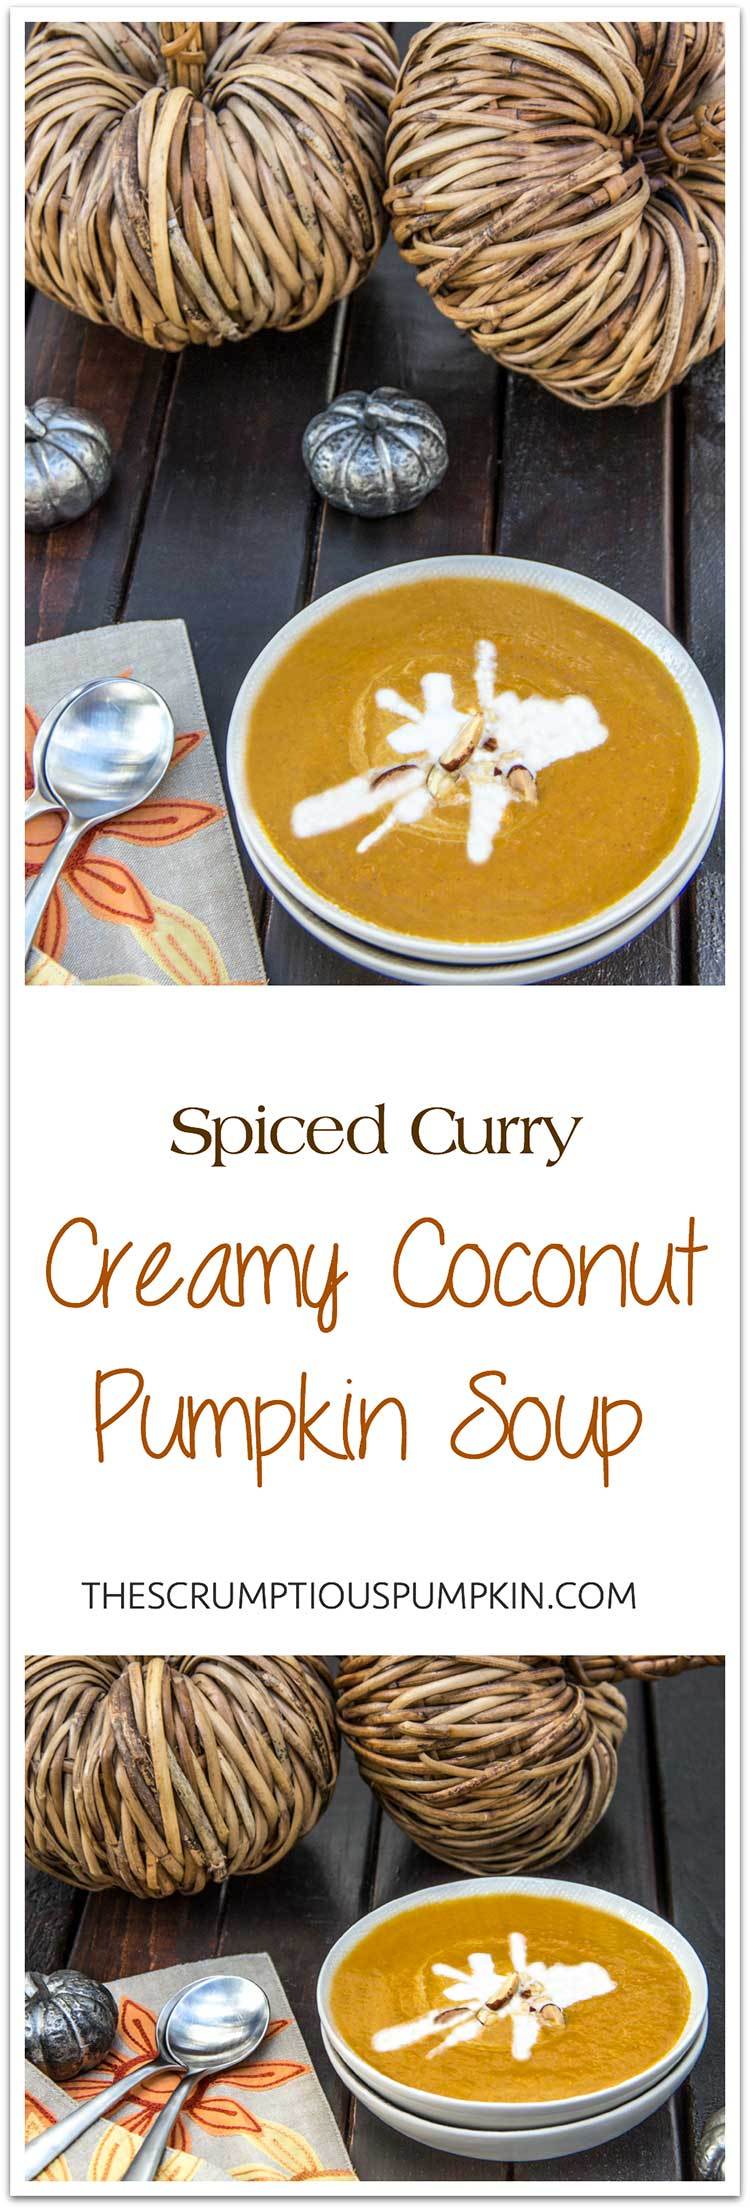 Spiced-Curry-Creamy-Coconut-Pumpkin-Soup